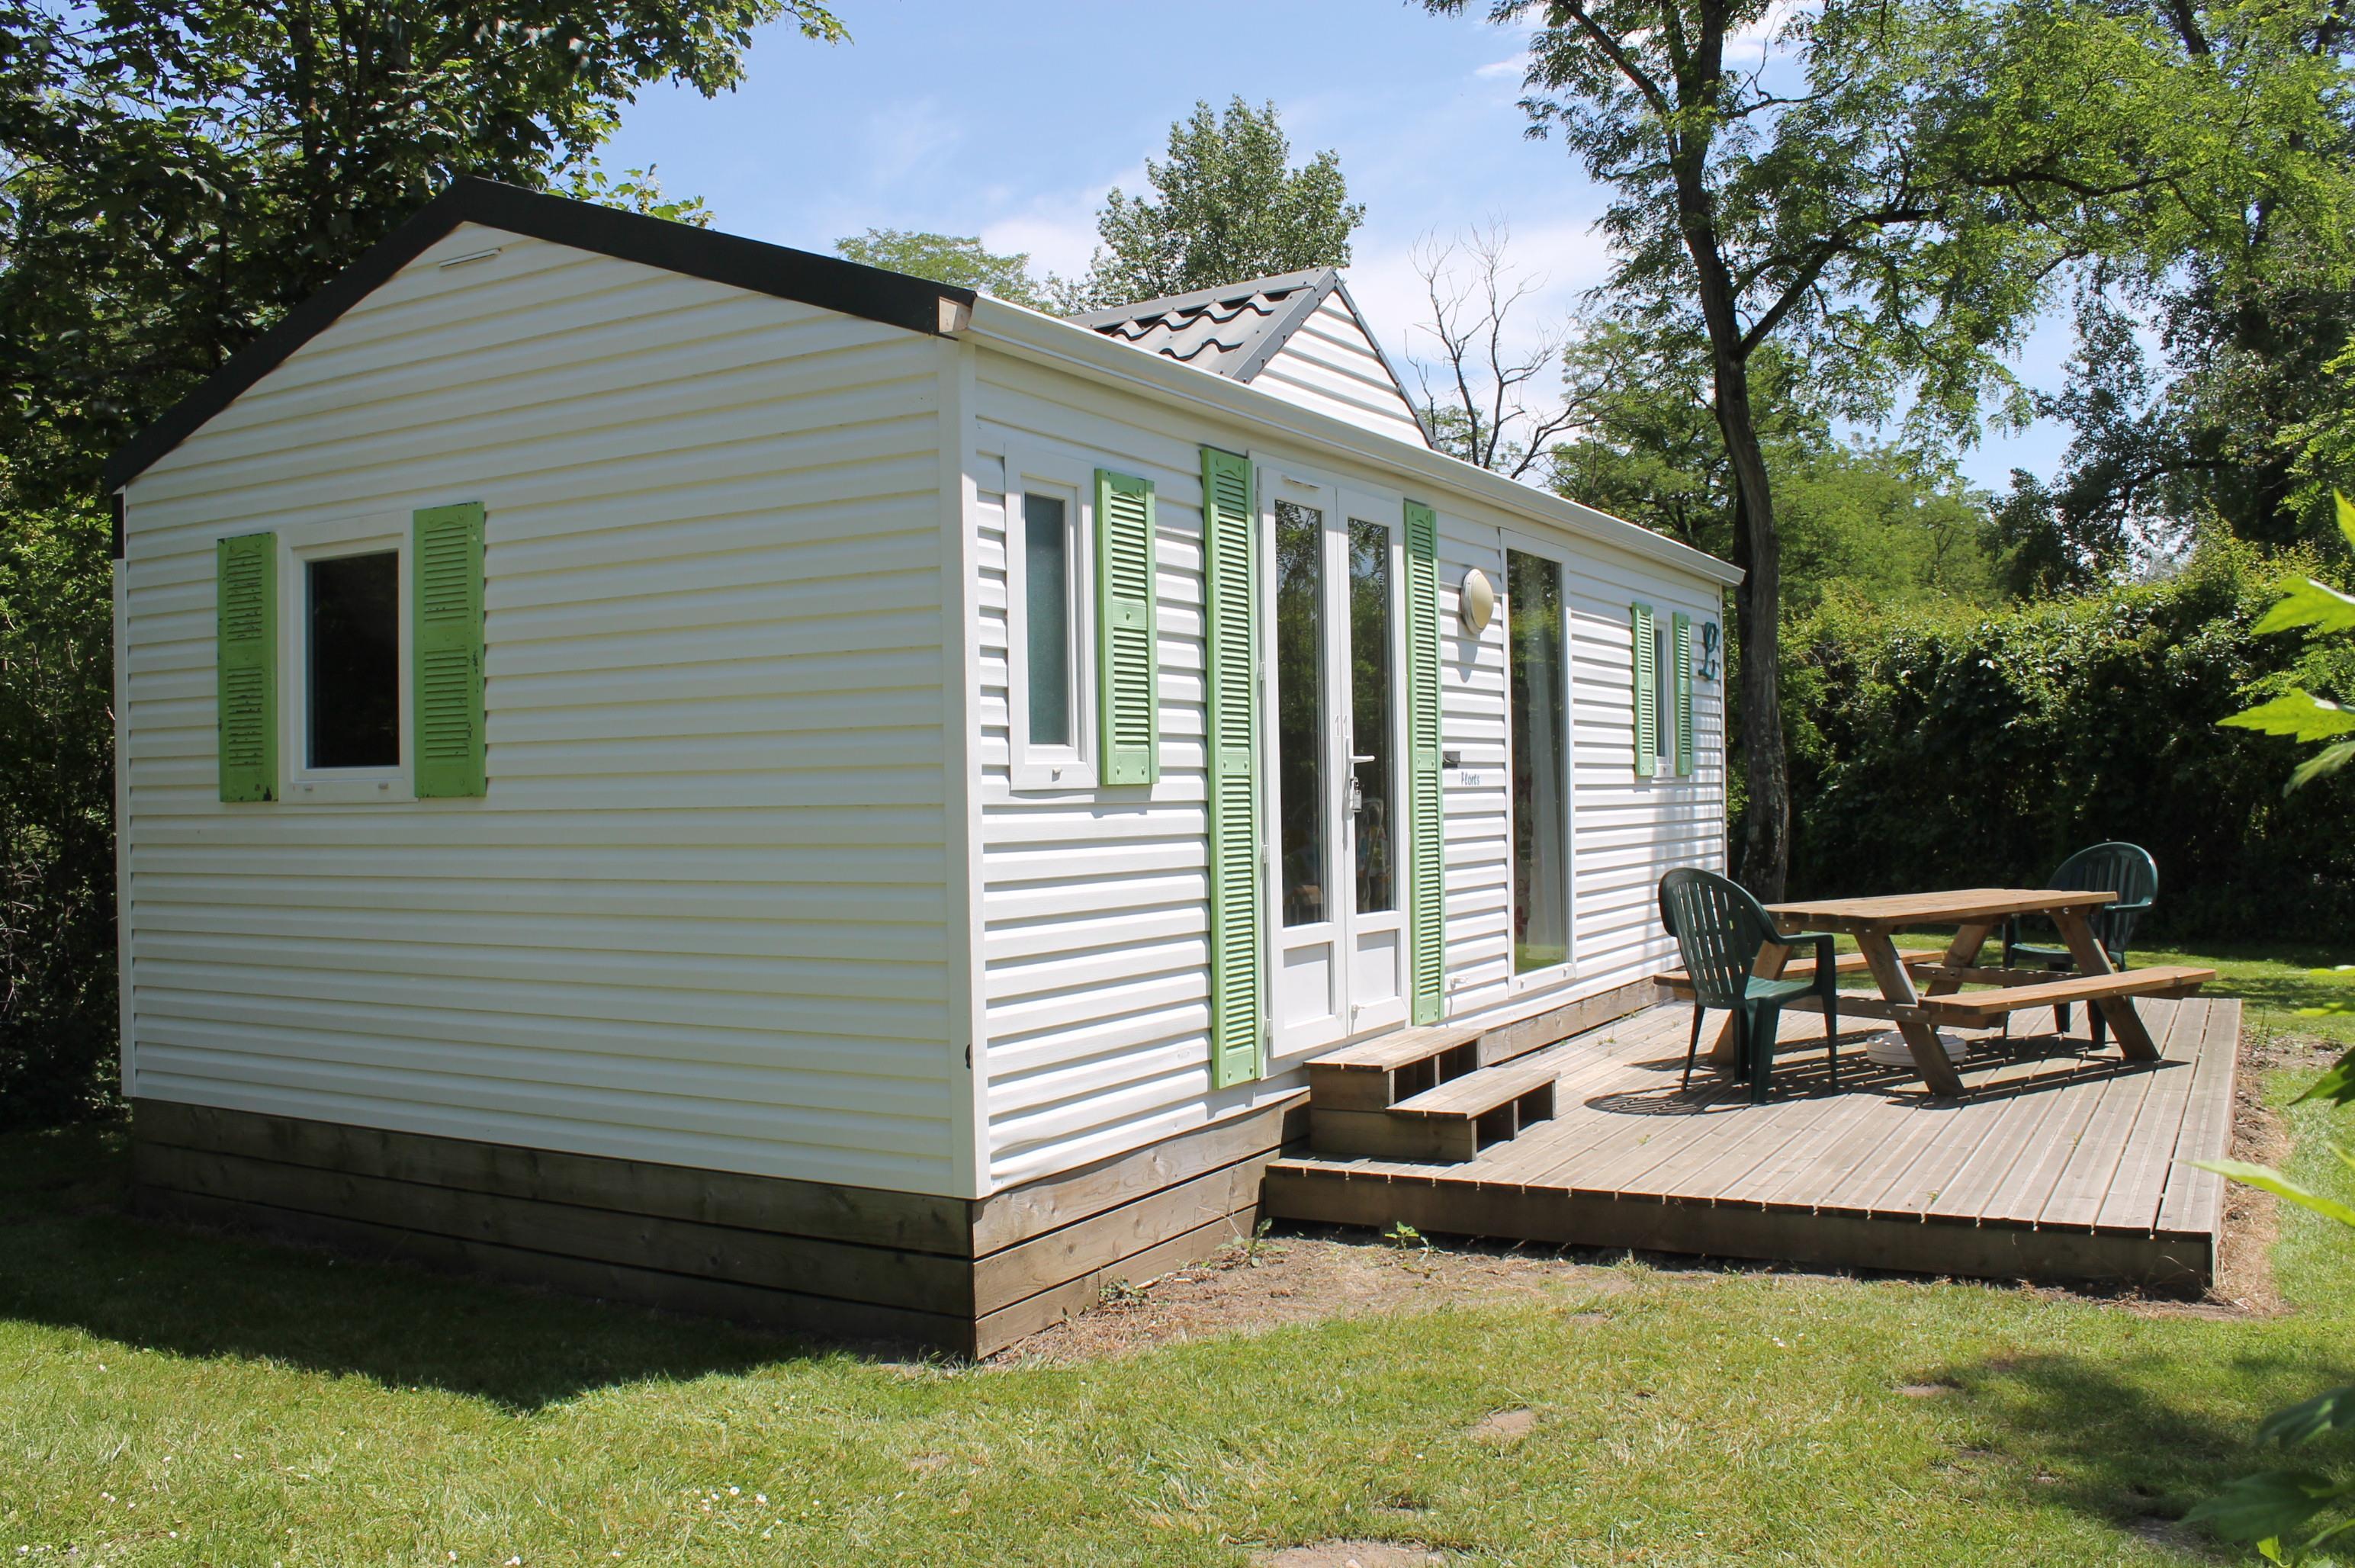 Camping la Croix St Martin (Vichy), Abrest / Vichy, Allier